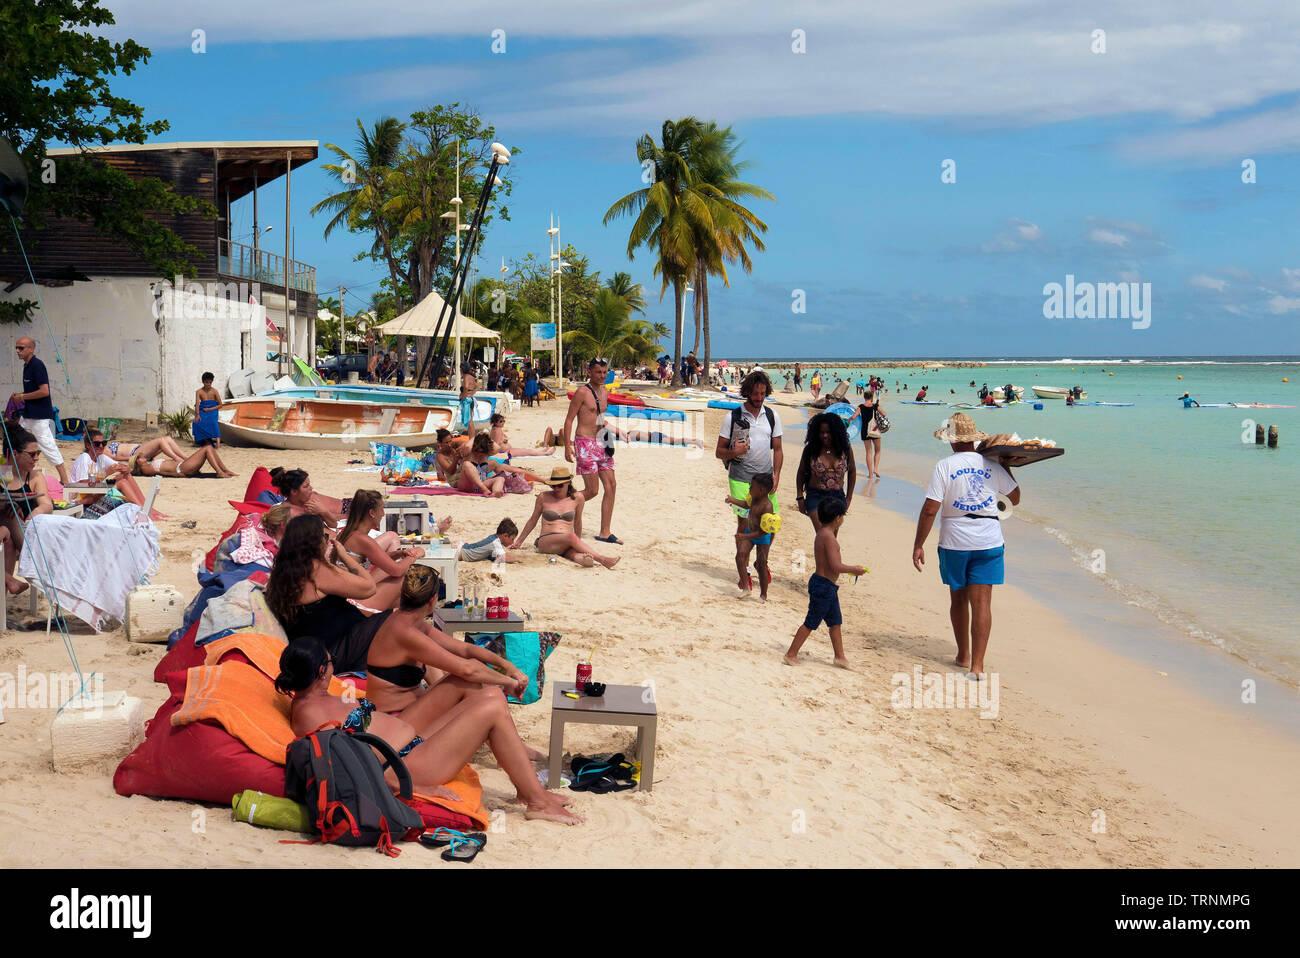 Sunbathers on Saint Anne beach in Basse-Terre Guadeloupe Stock Photo